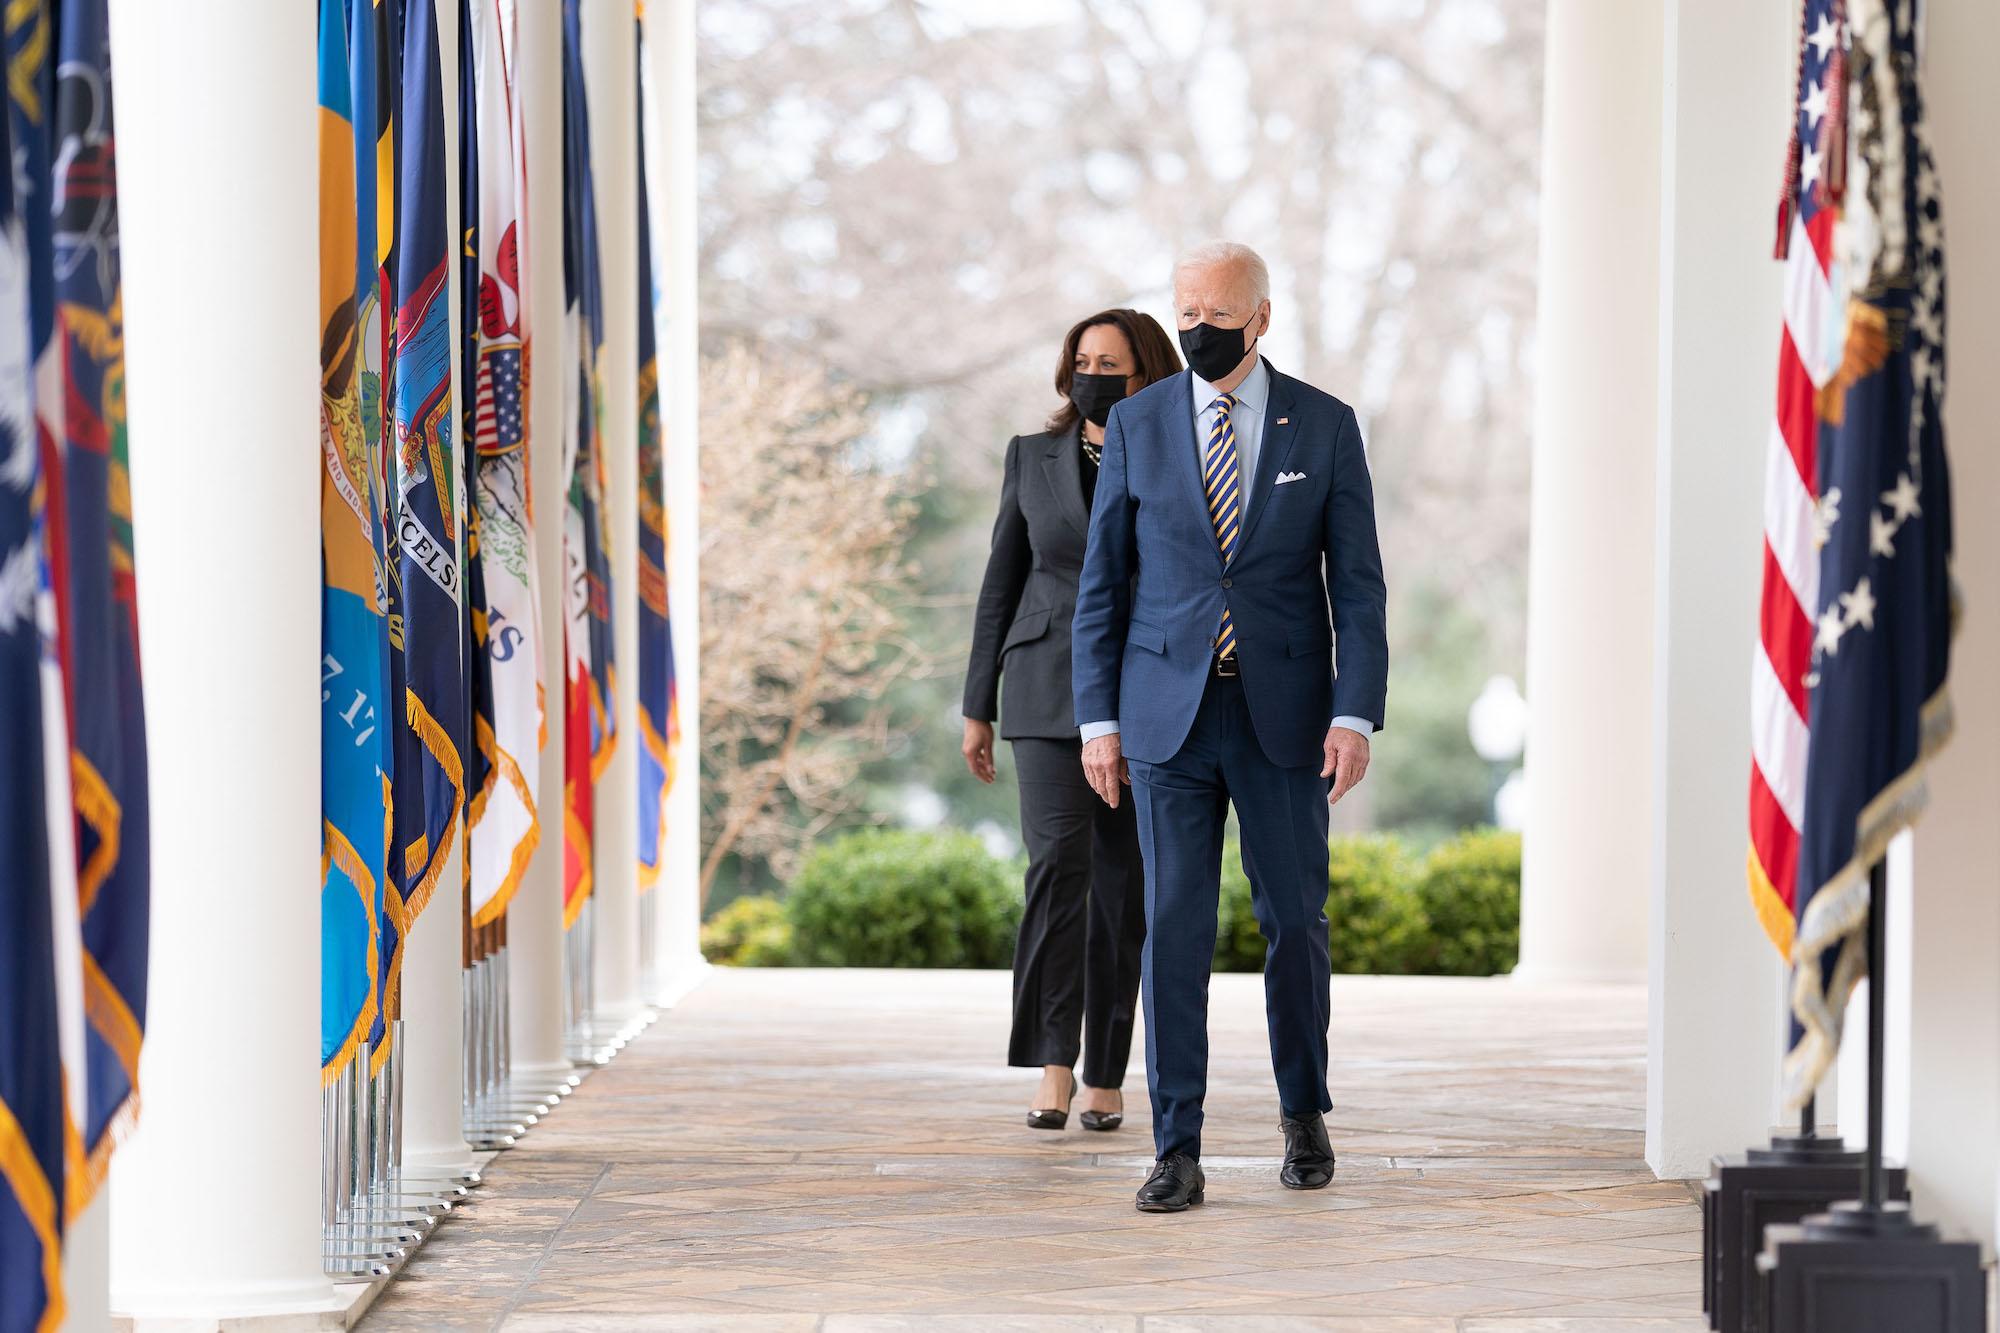 President Biden and Vice President Kamala Harris walk down a breezeway outside the White House